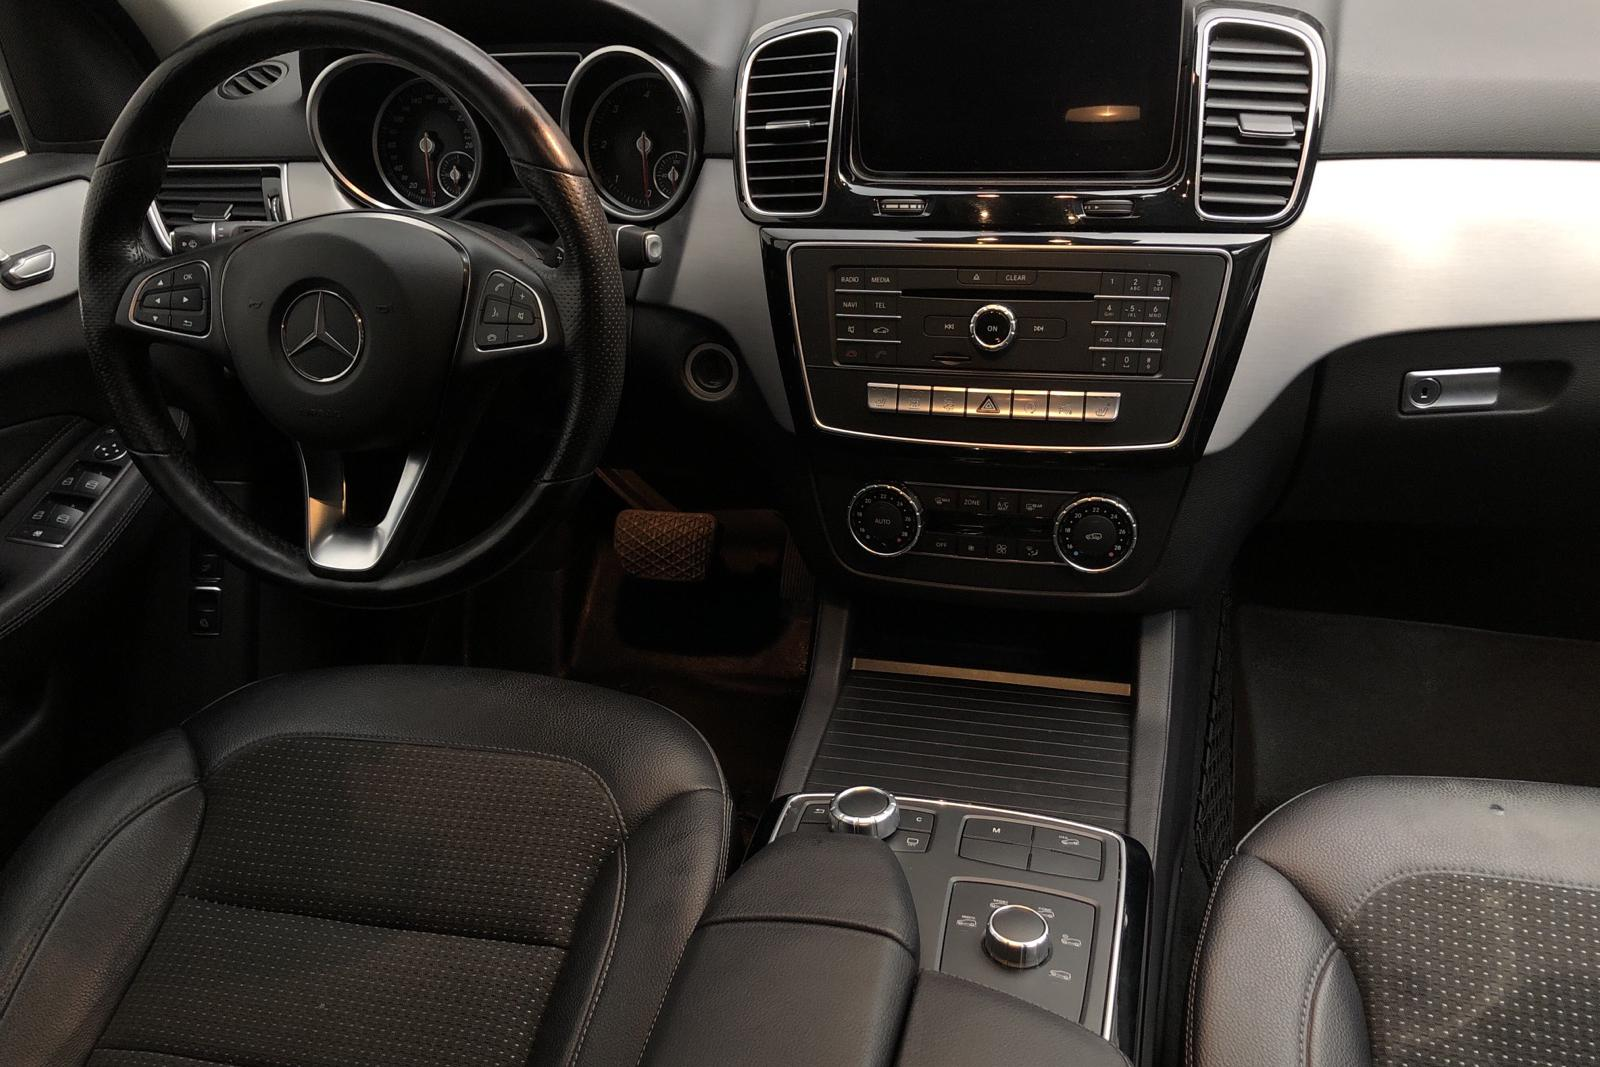 Mercedes GLE 250 d 4MATIC W166 (204hk) - 9 304 mil - Automat - vit - 2016